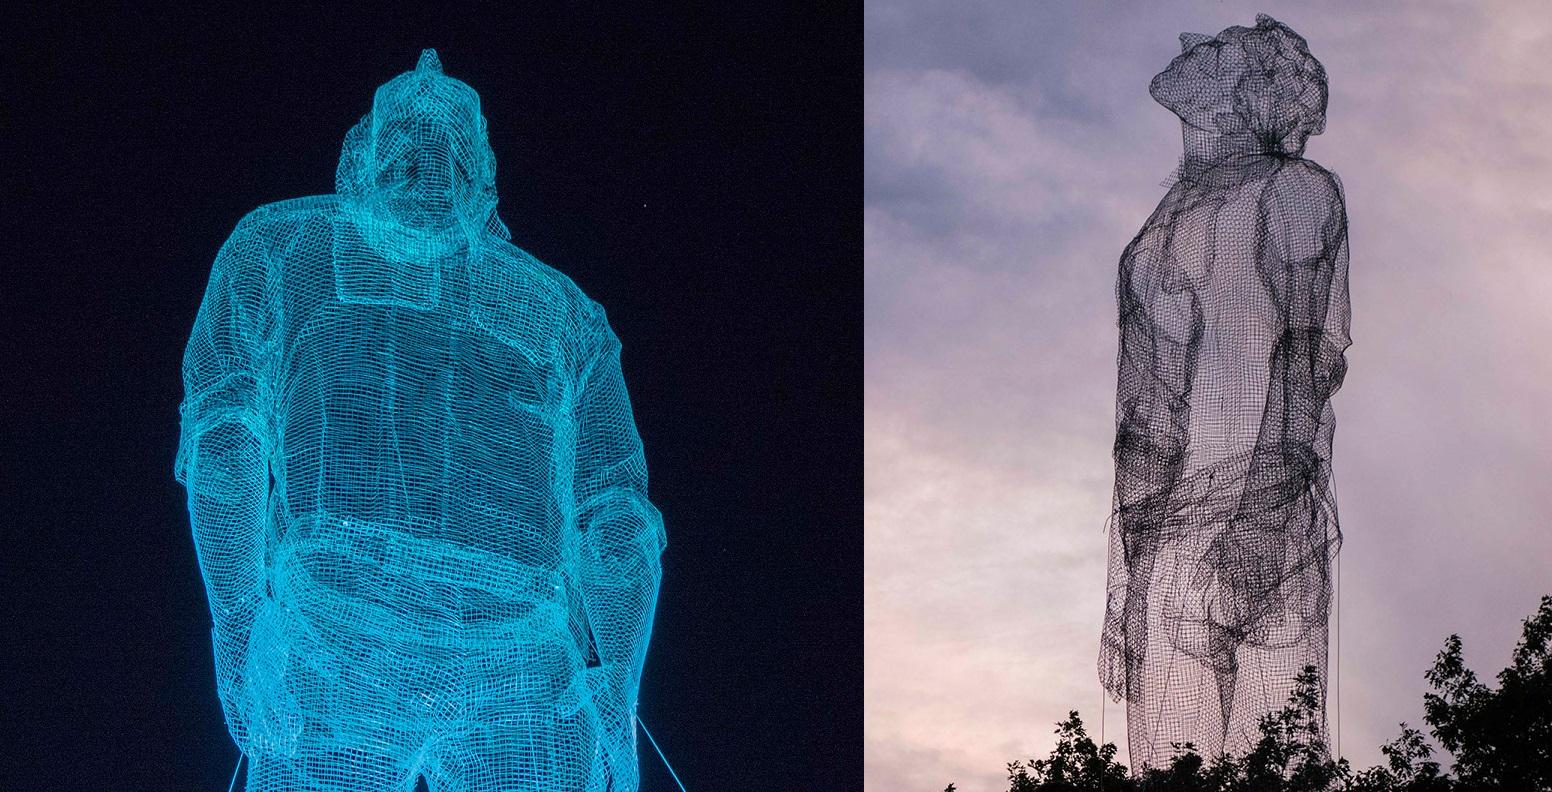 The Impressive Large-Scale Sculptures of Edoardo Tresoldi | Art-Sheep